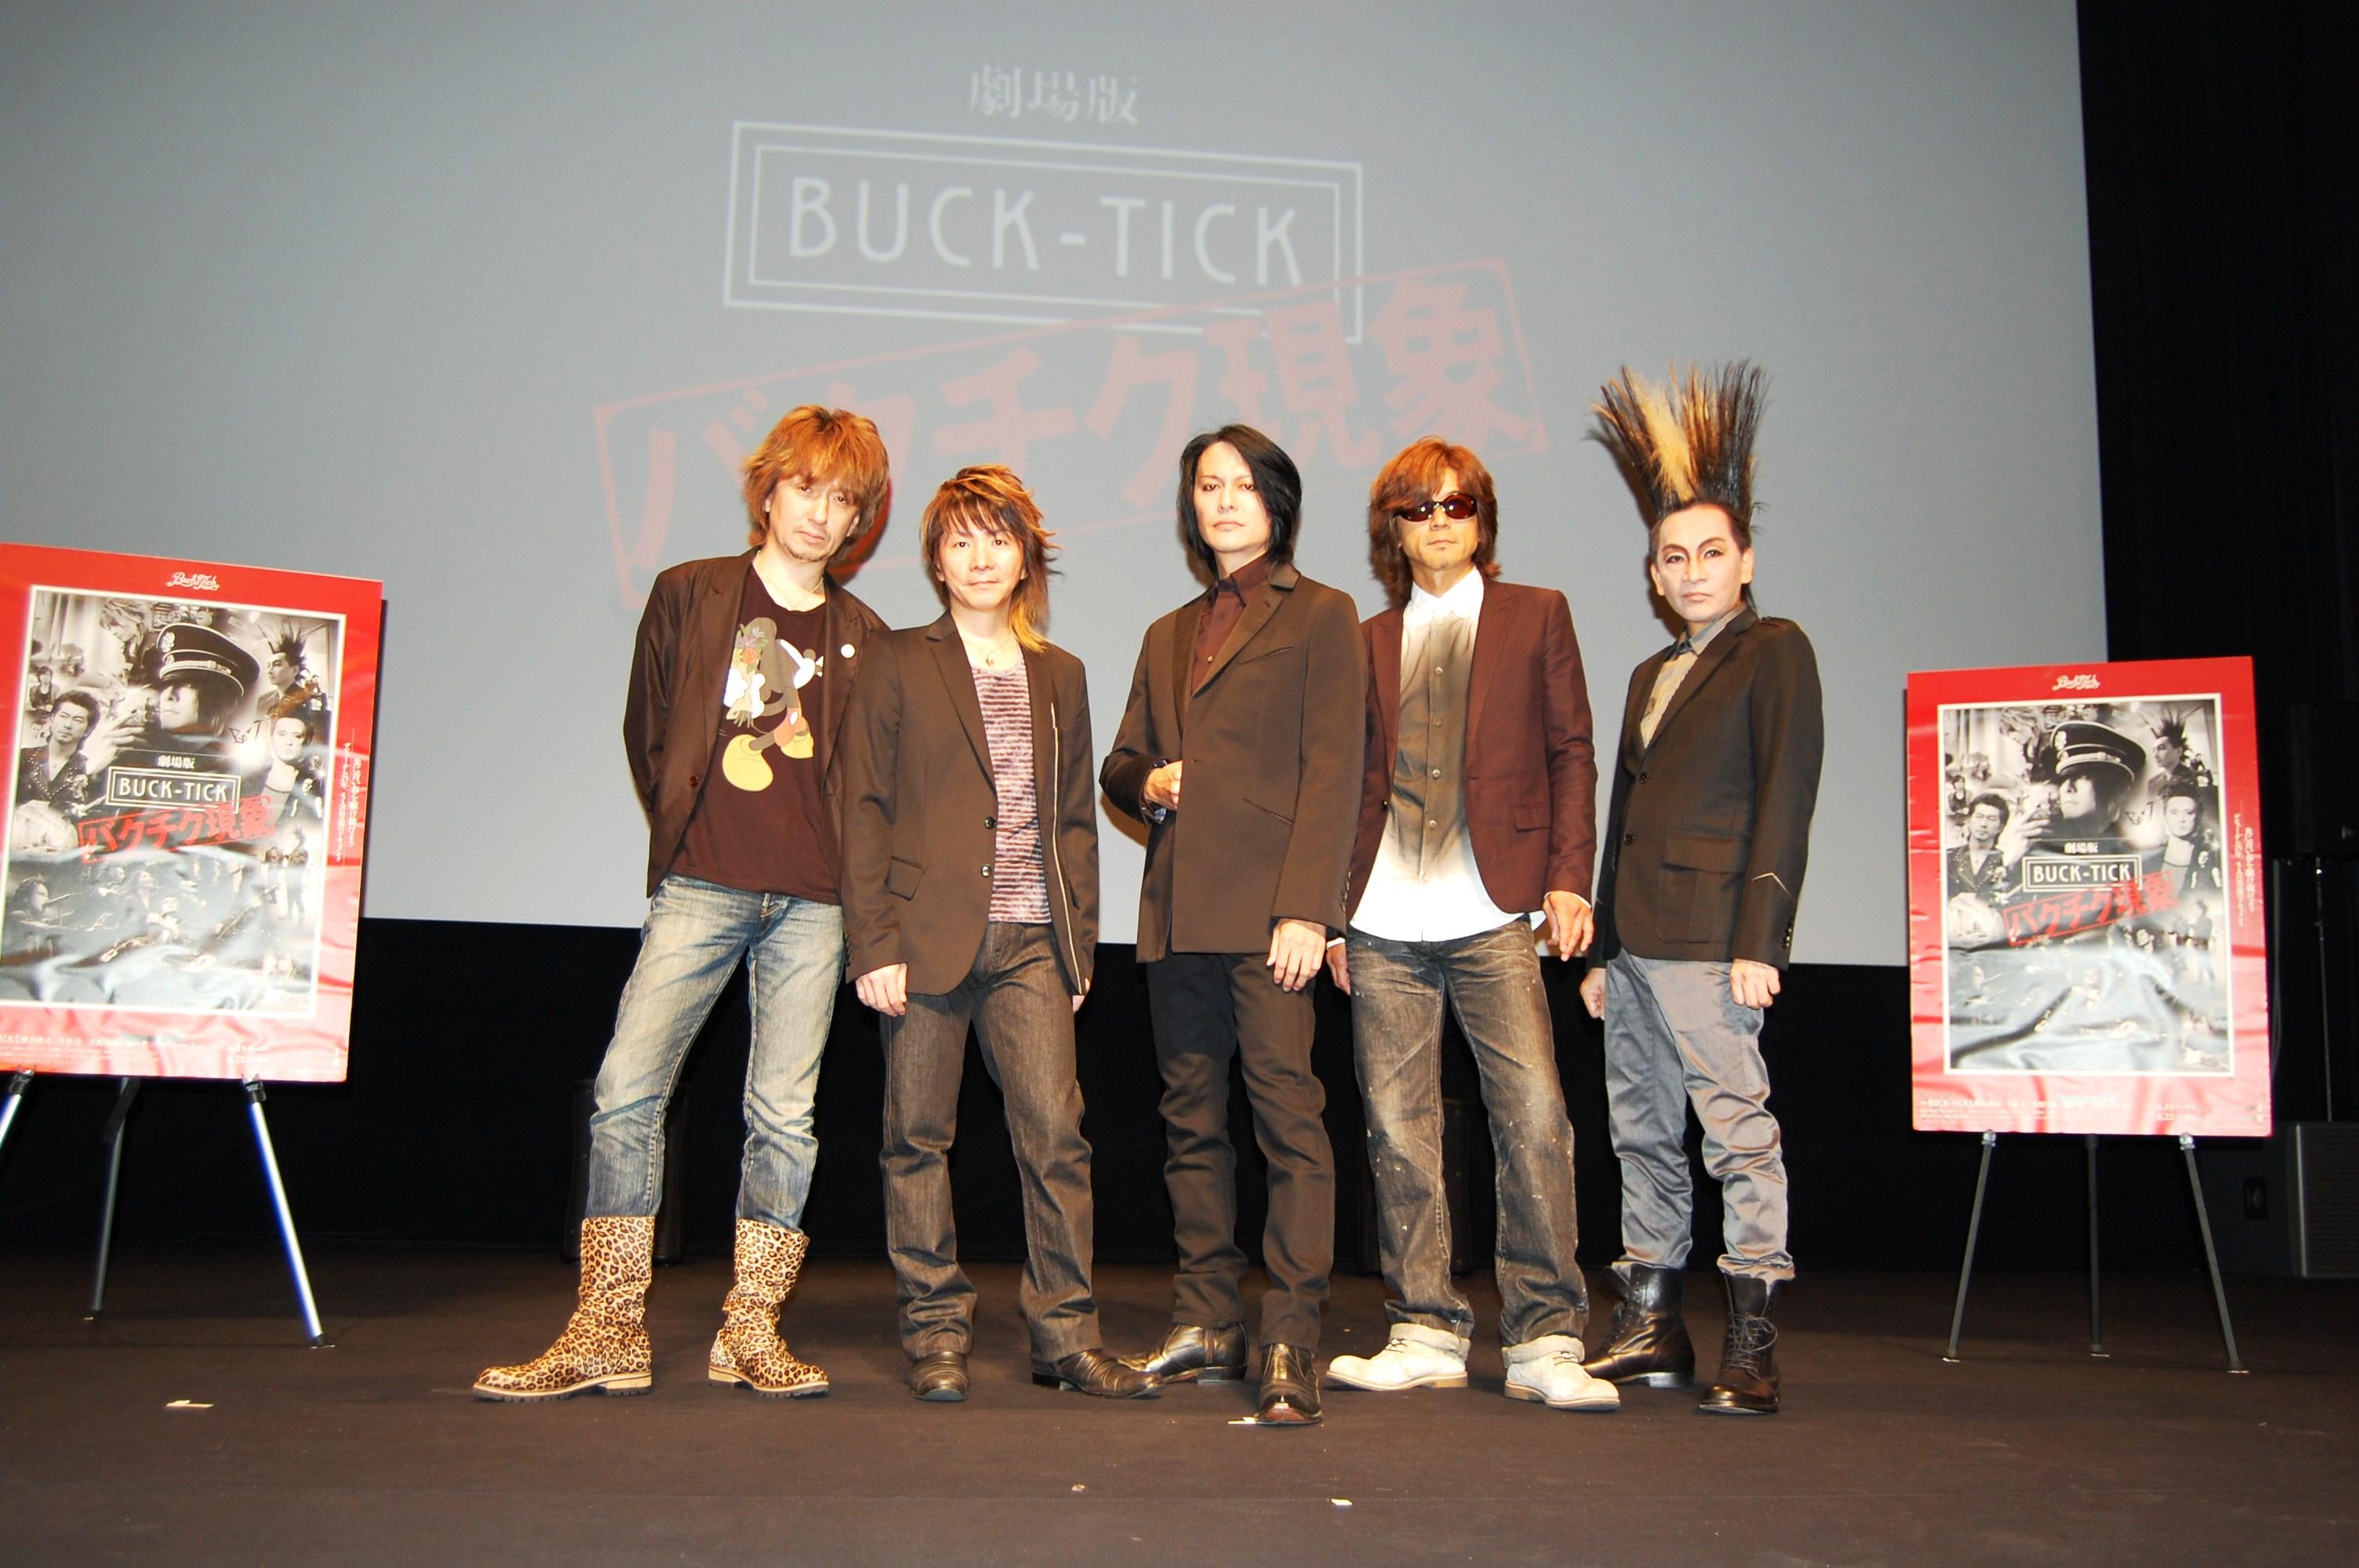 BUCK-TICK 最速上映会にサプライズ登場